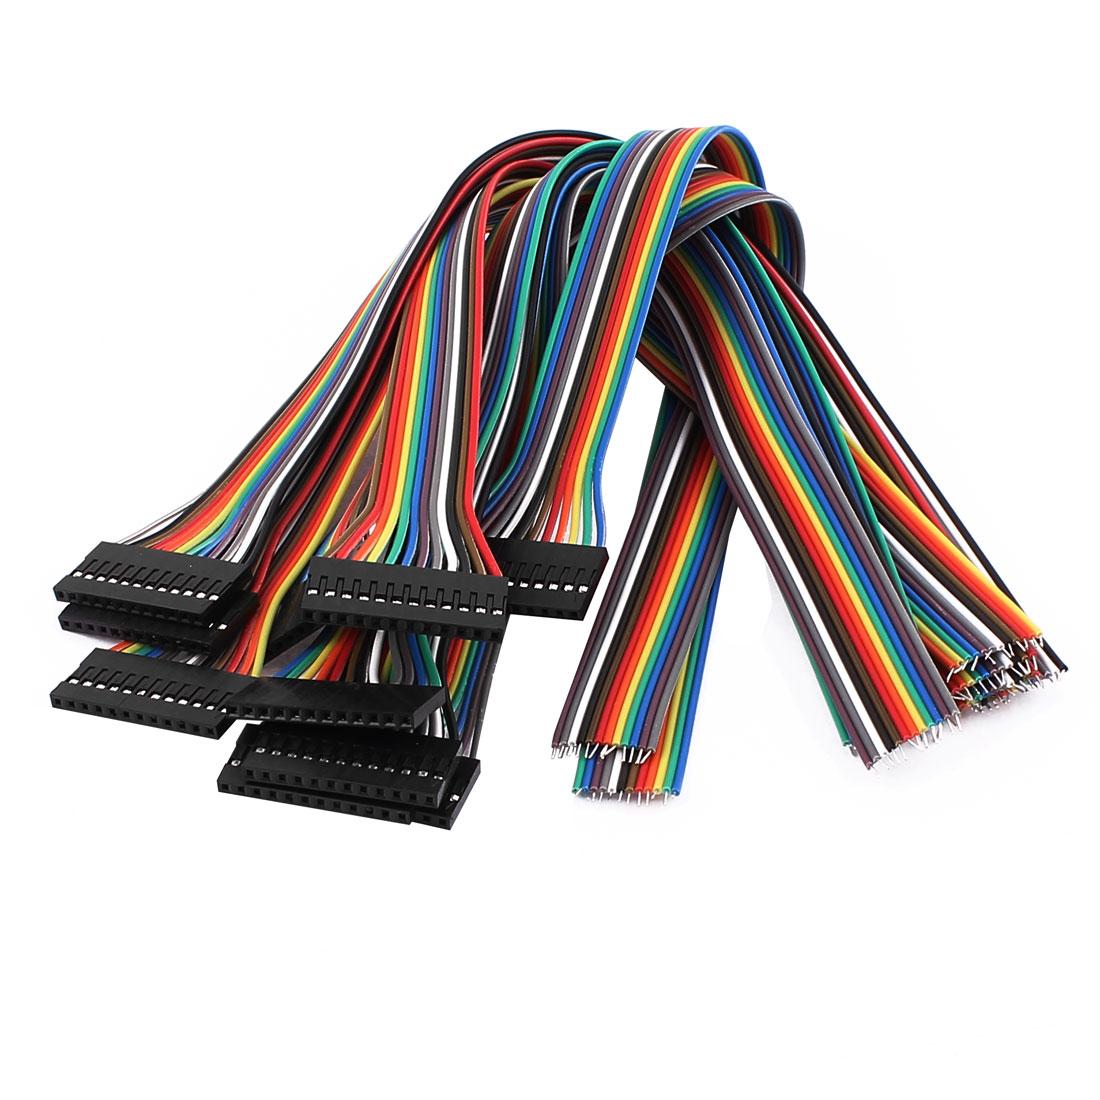 10 Pcs 12P Jumper Wires Female Ribbon Cables Pi Pic Breadboard 30cm Long